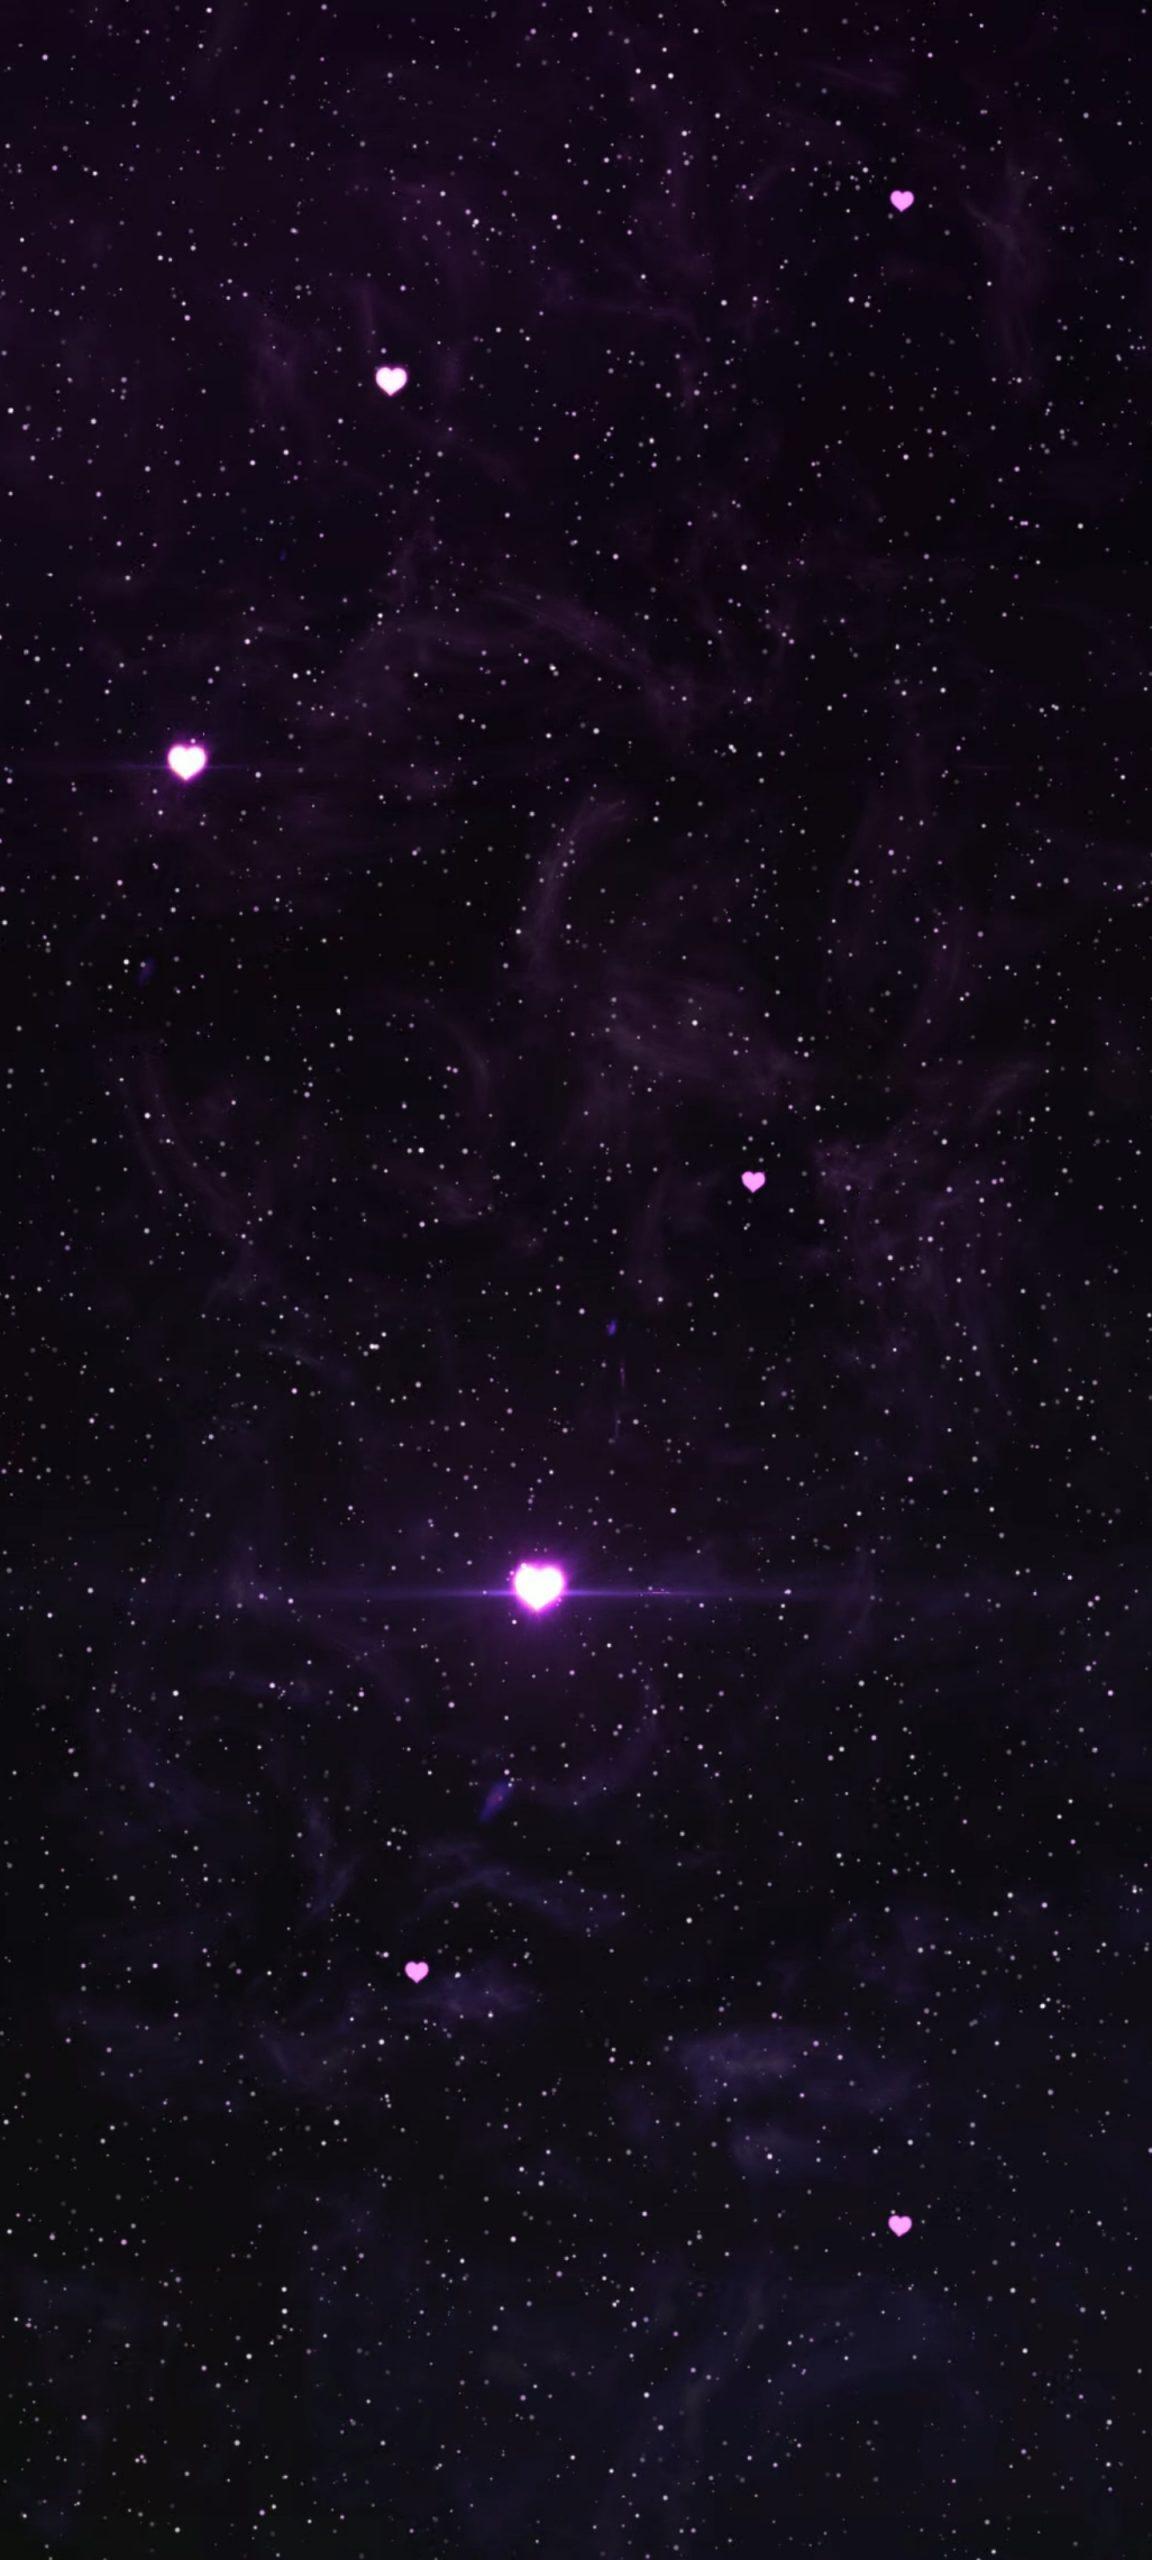 hinh nen dien thoai samsung galaxy s20 plus bts edition 3 scaled